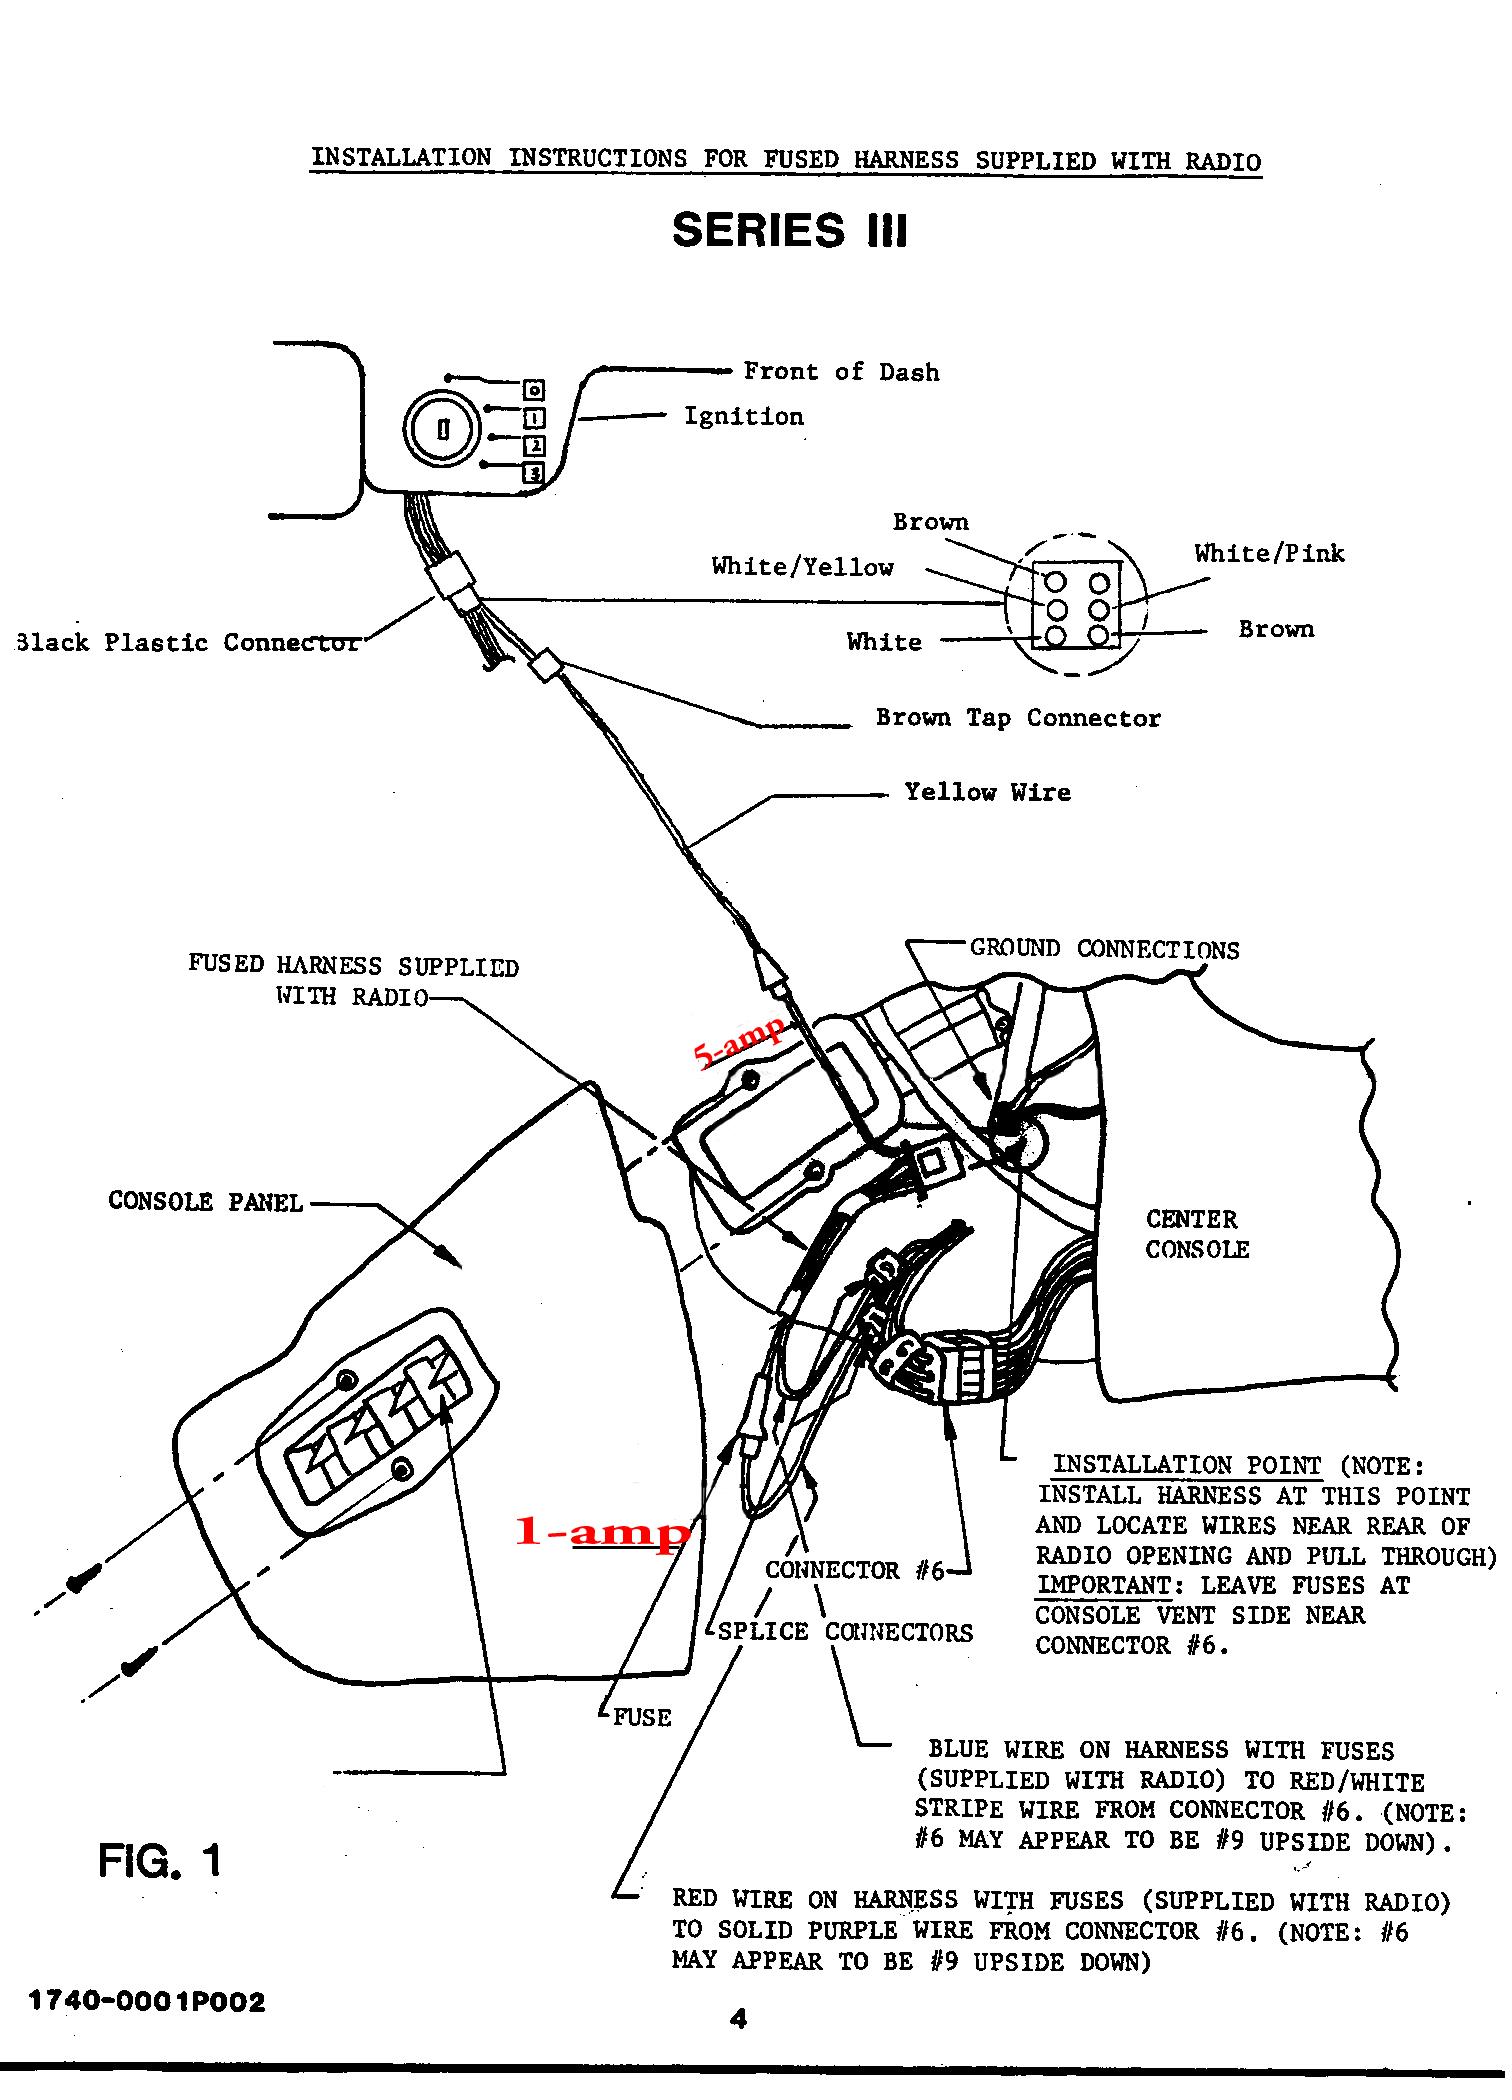 12v cigarette lighter socket wiring diagram amarok 1990 jeep wrangler library